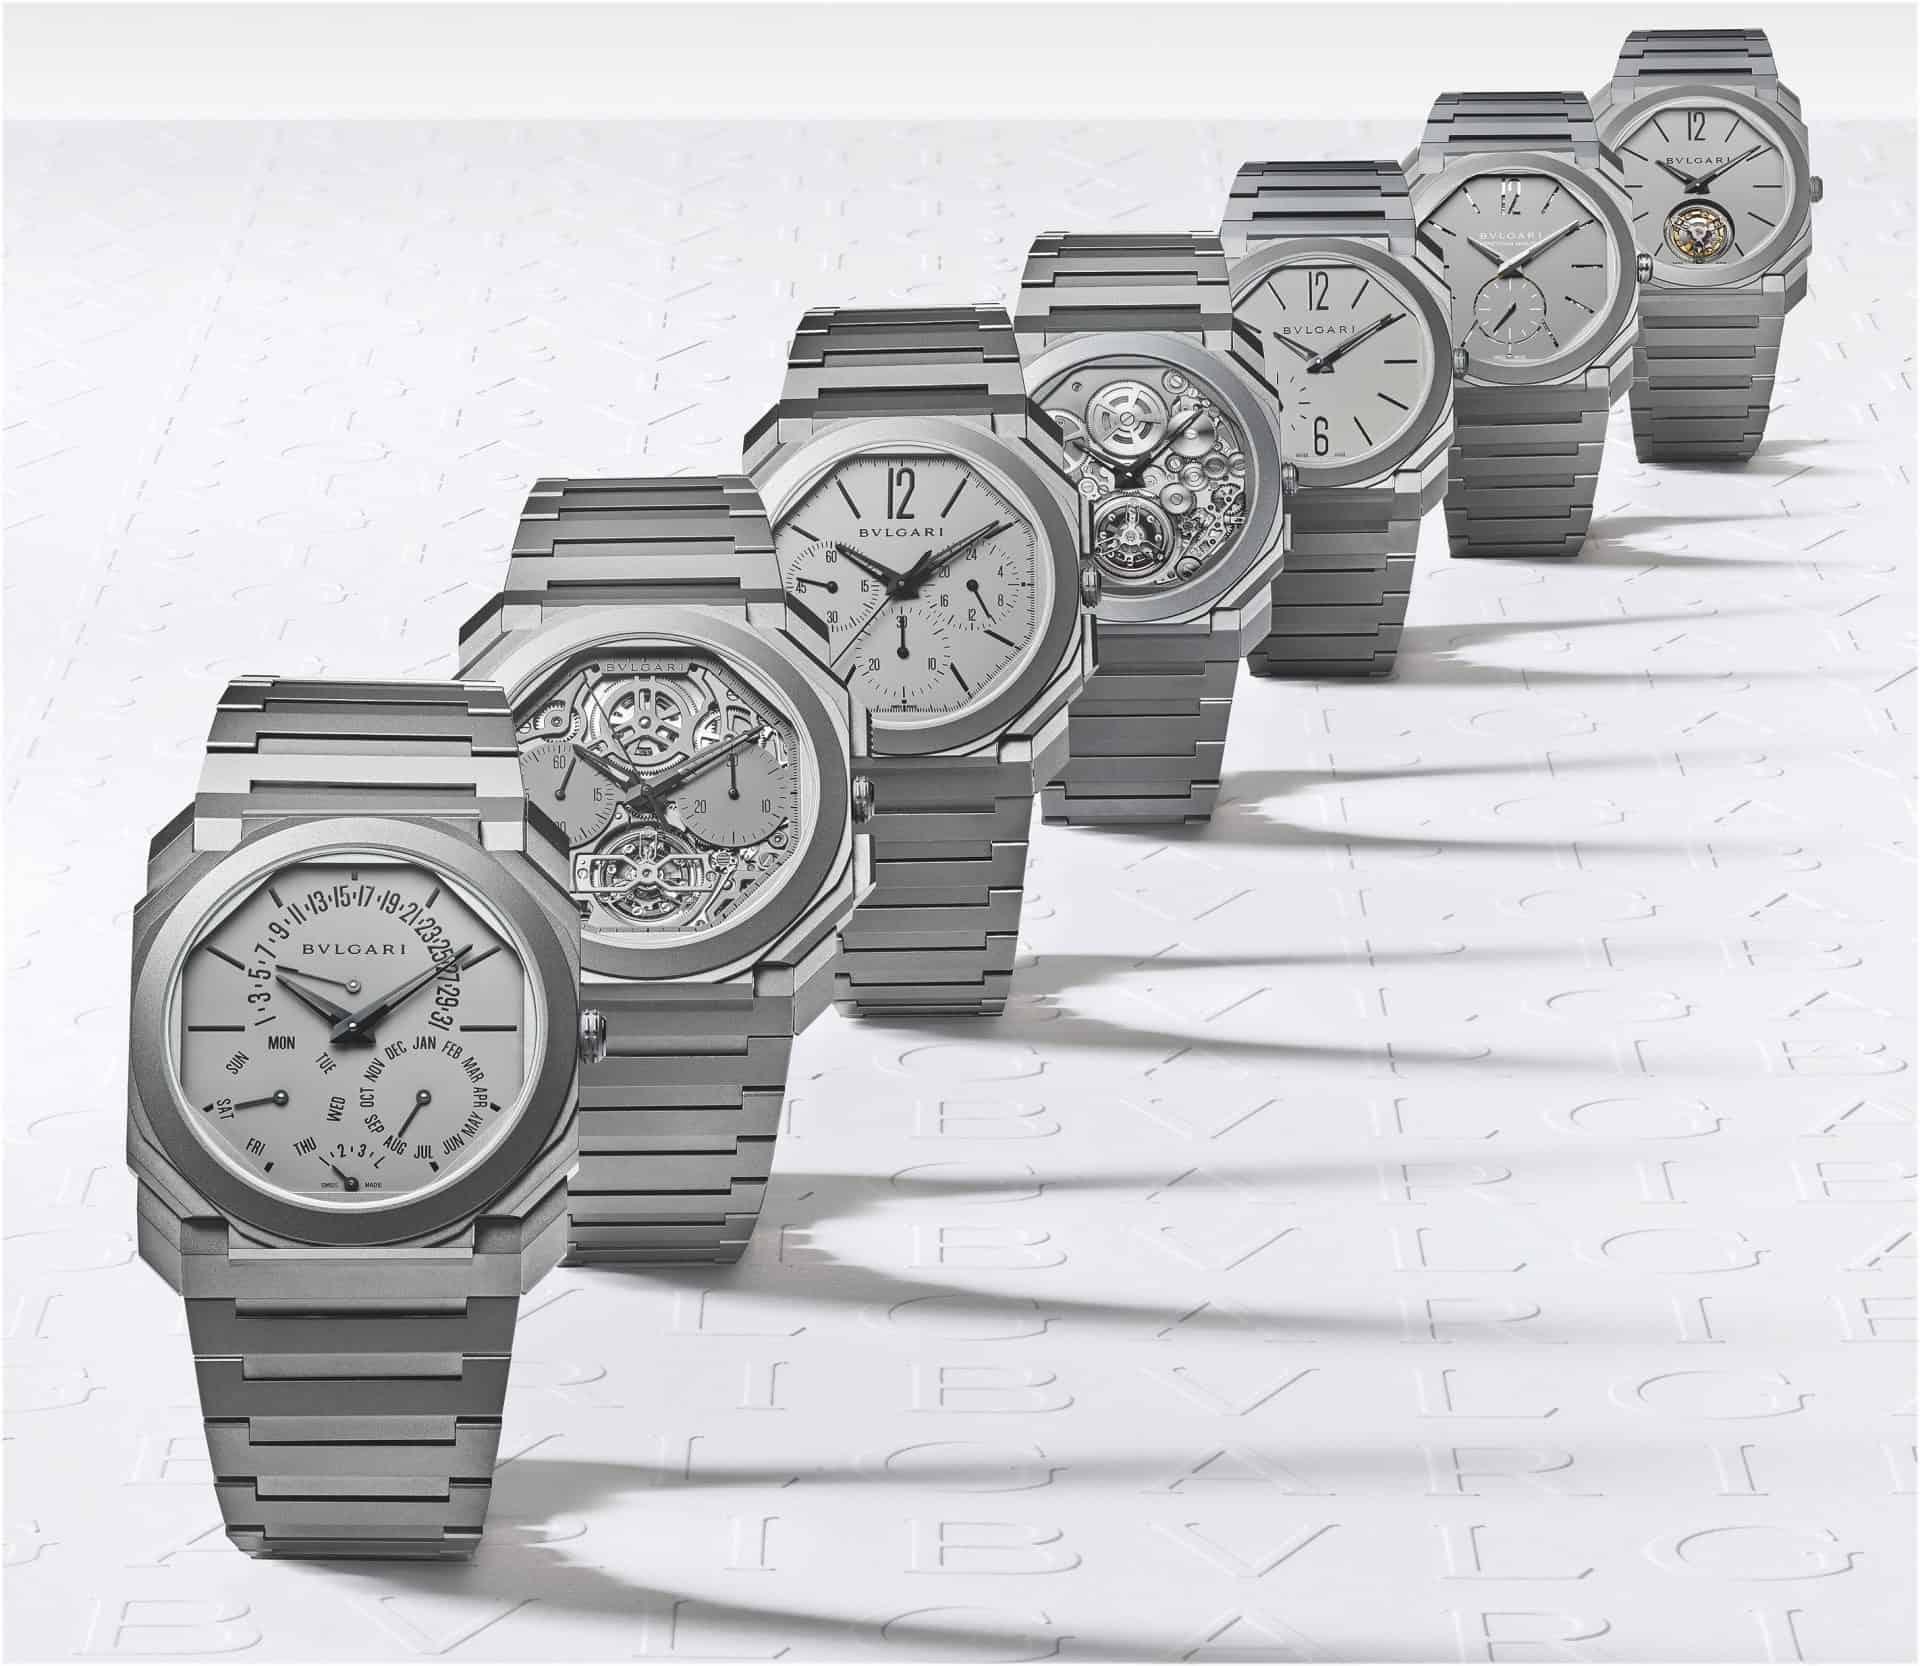 7 superflache Bulgari Uhren Referenzen 103295 102713 103068 103015 102937 103016 103200